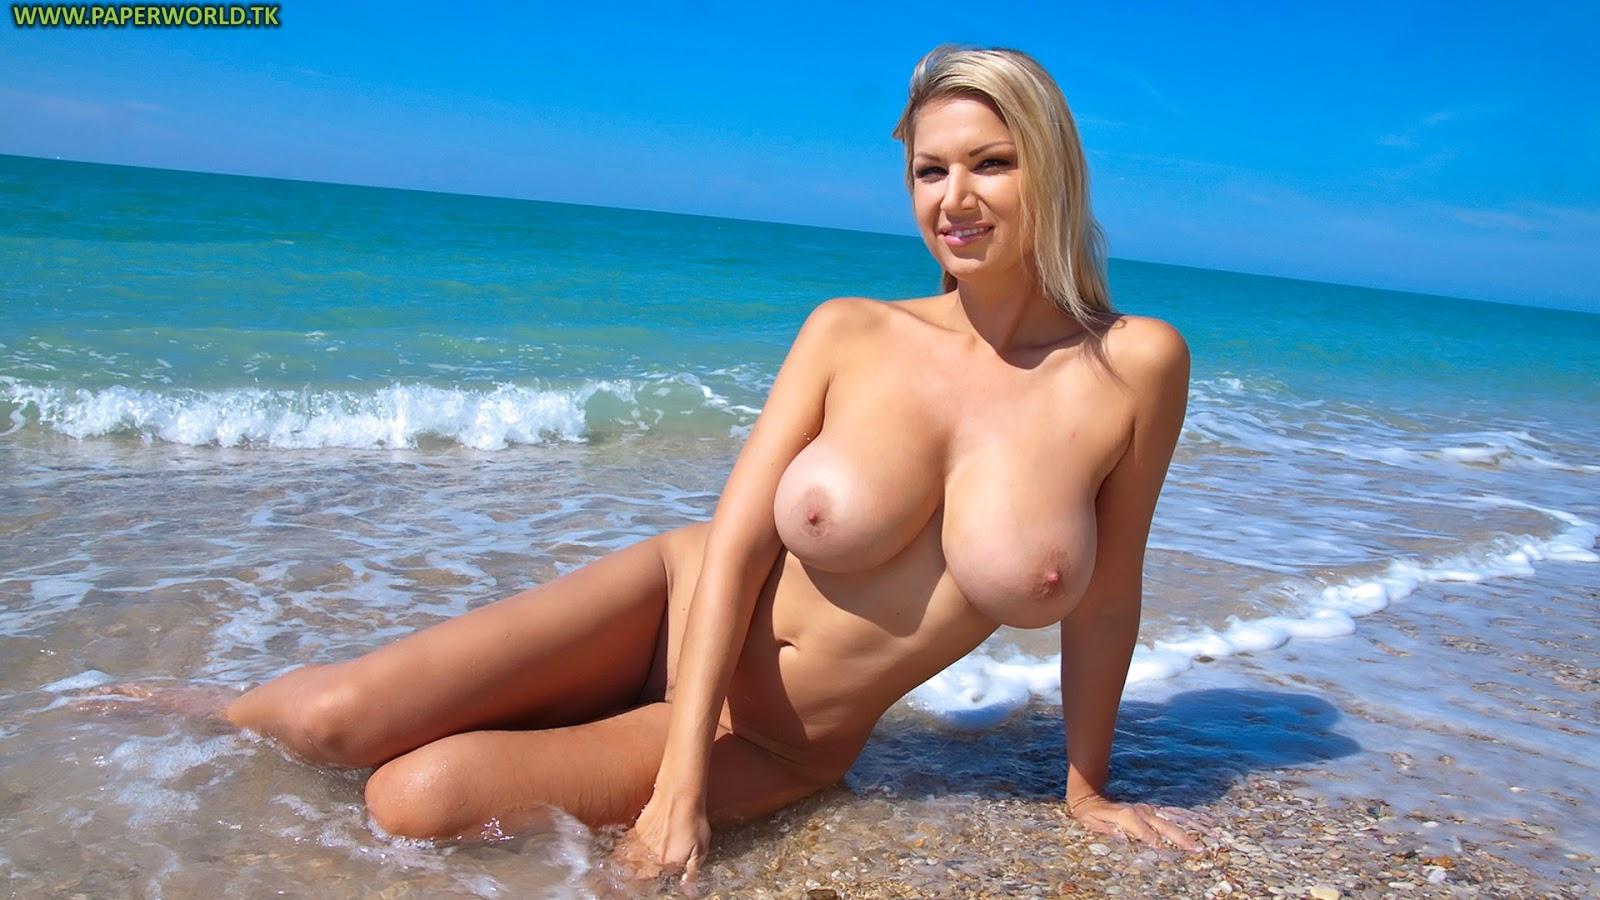 Regret, that big natural tits beach mistaken